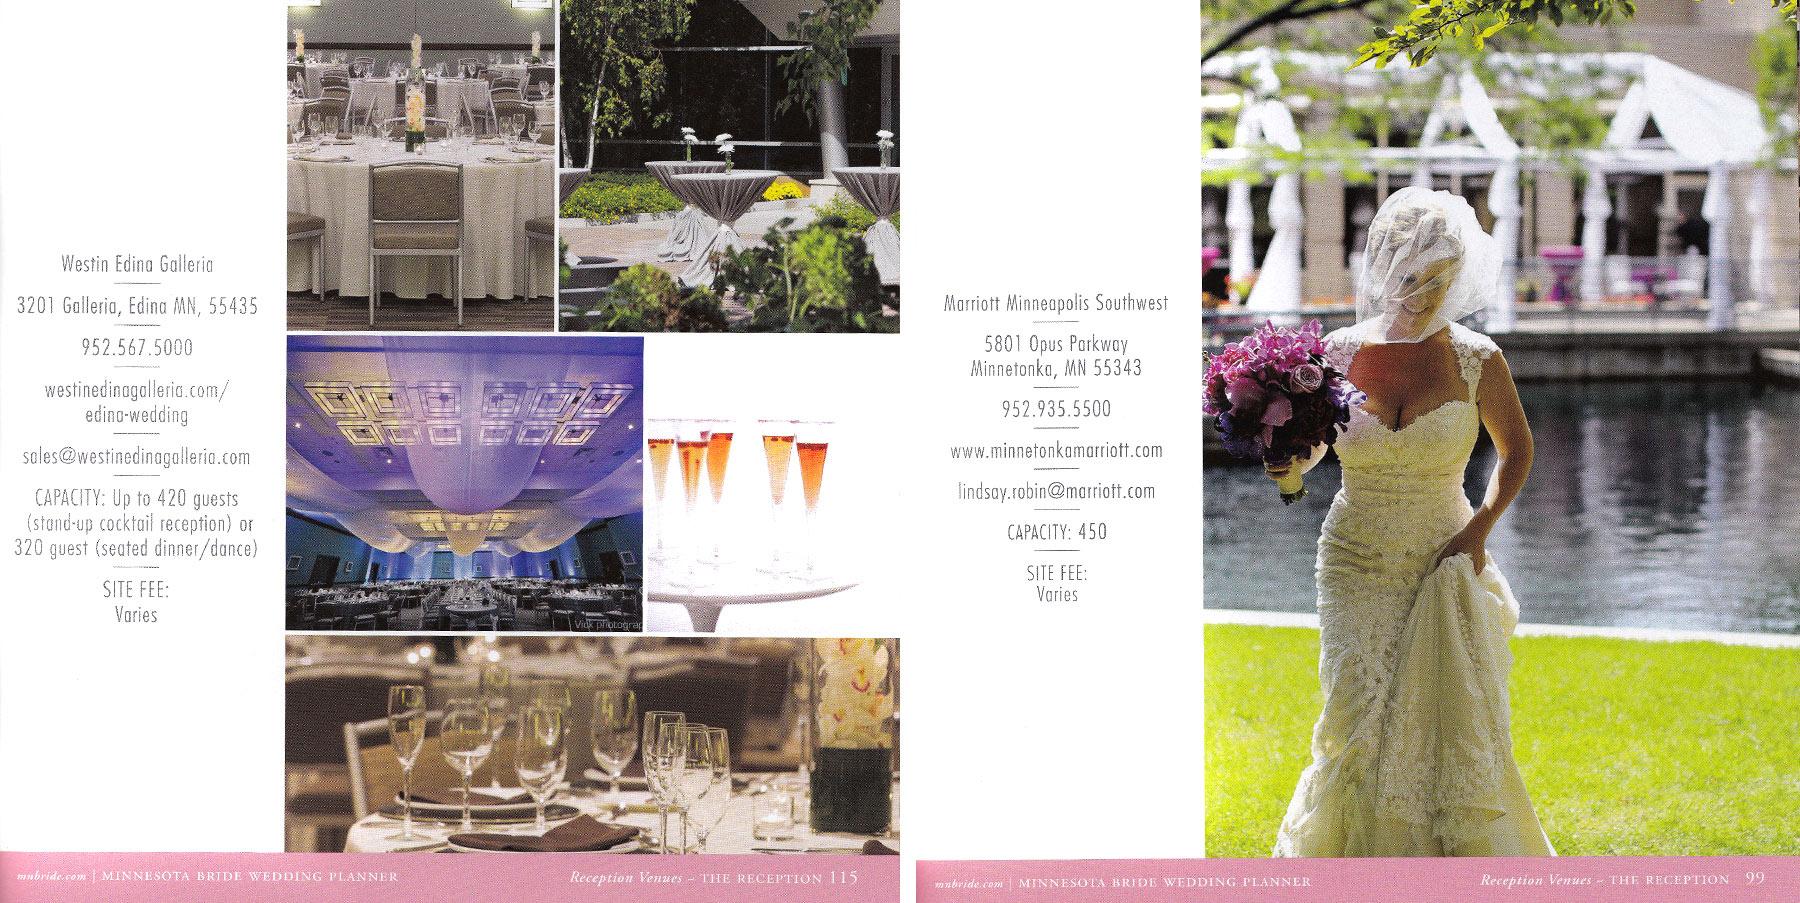 MN-Bride-Planner-2016_02.jpg